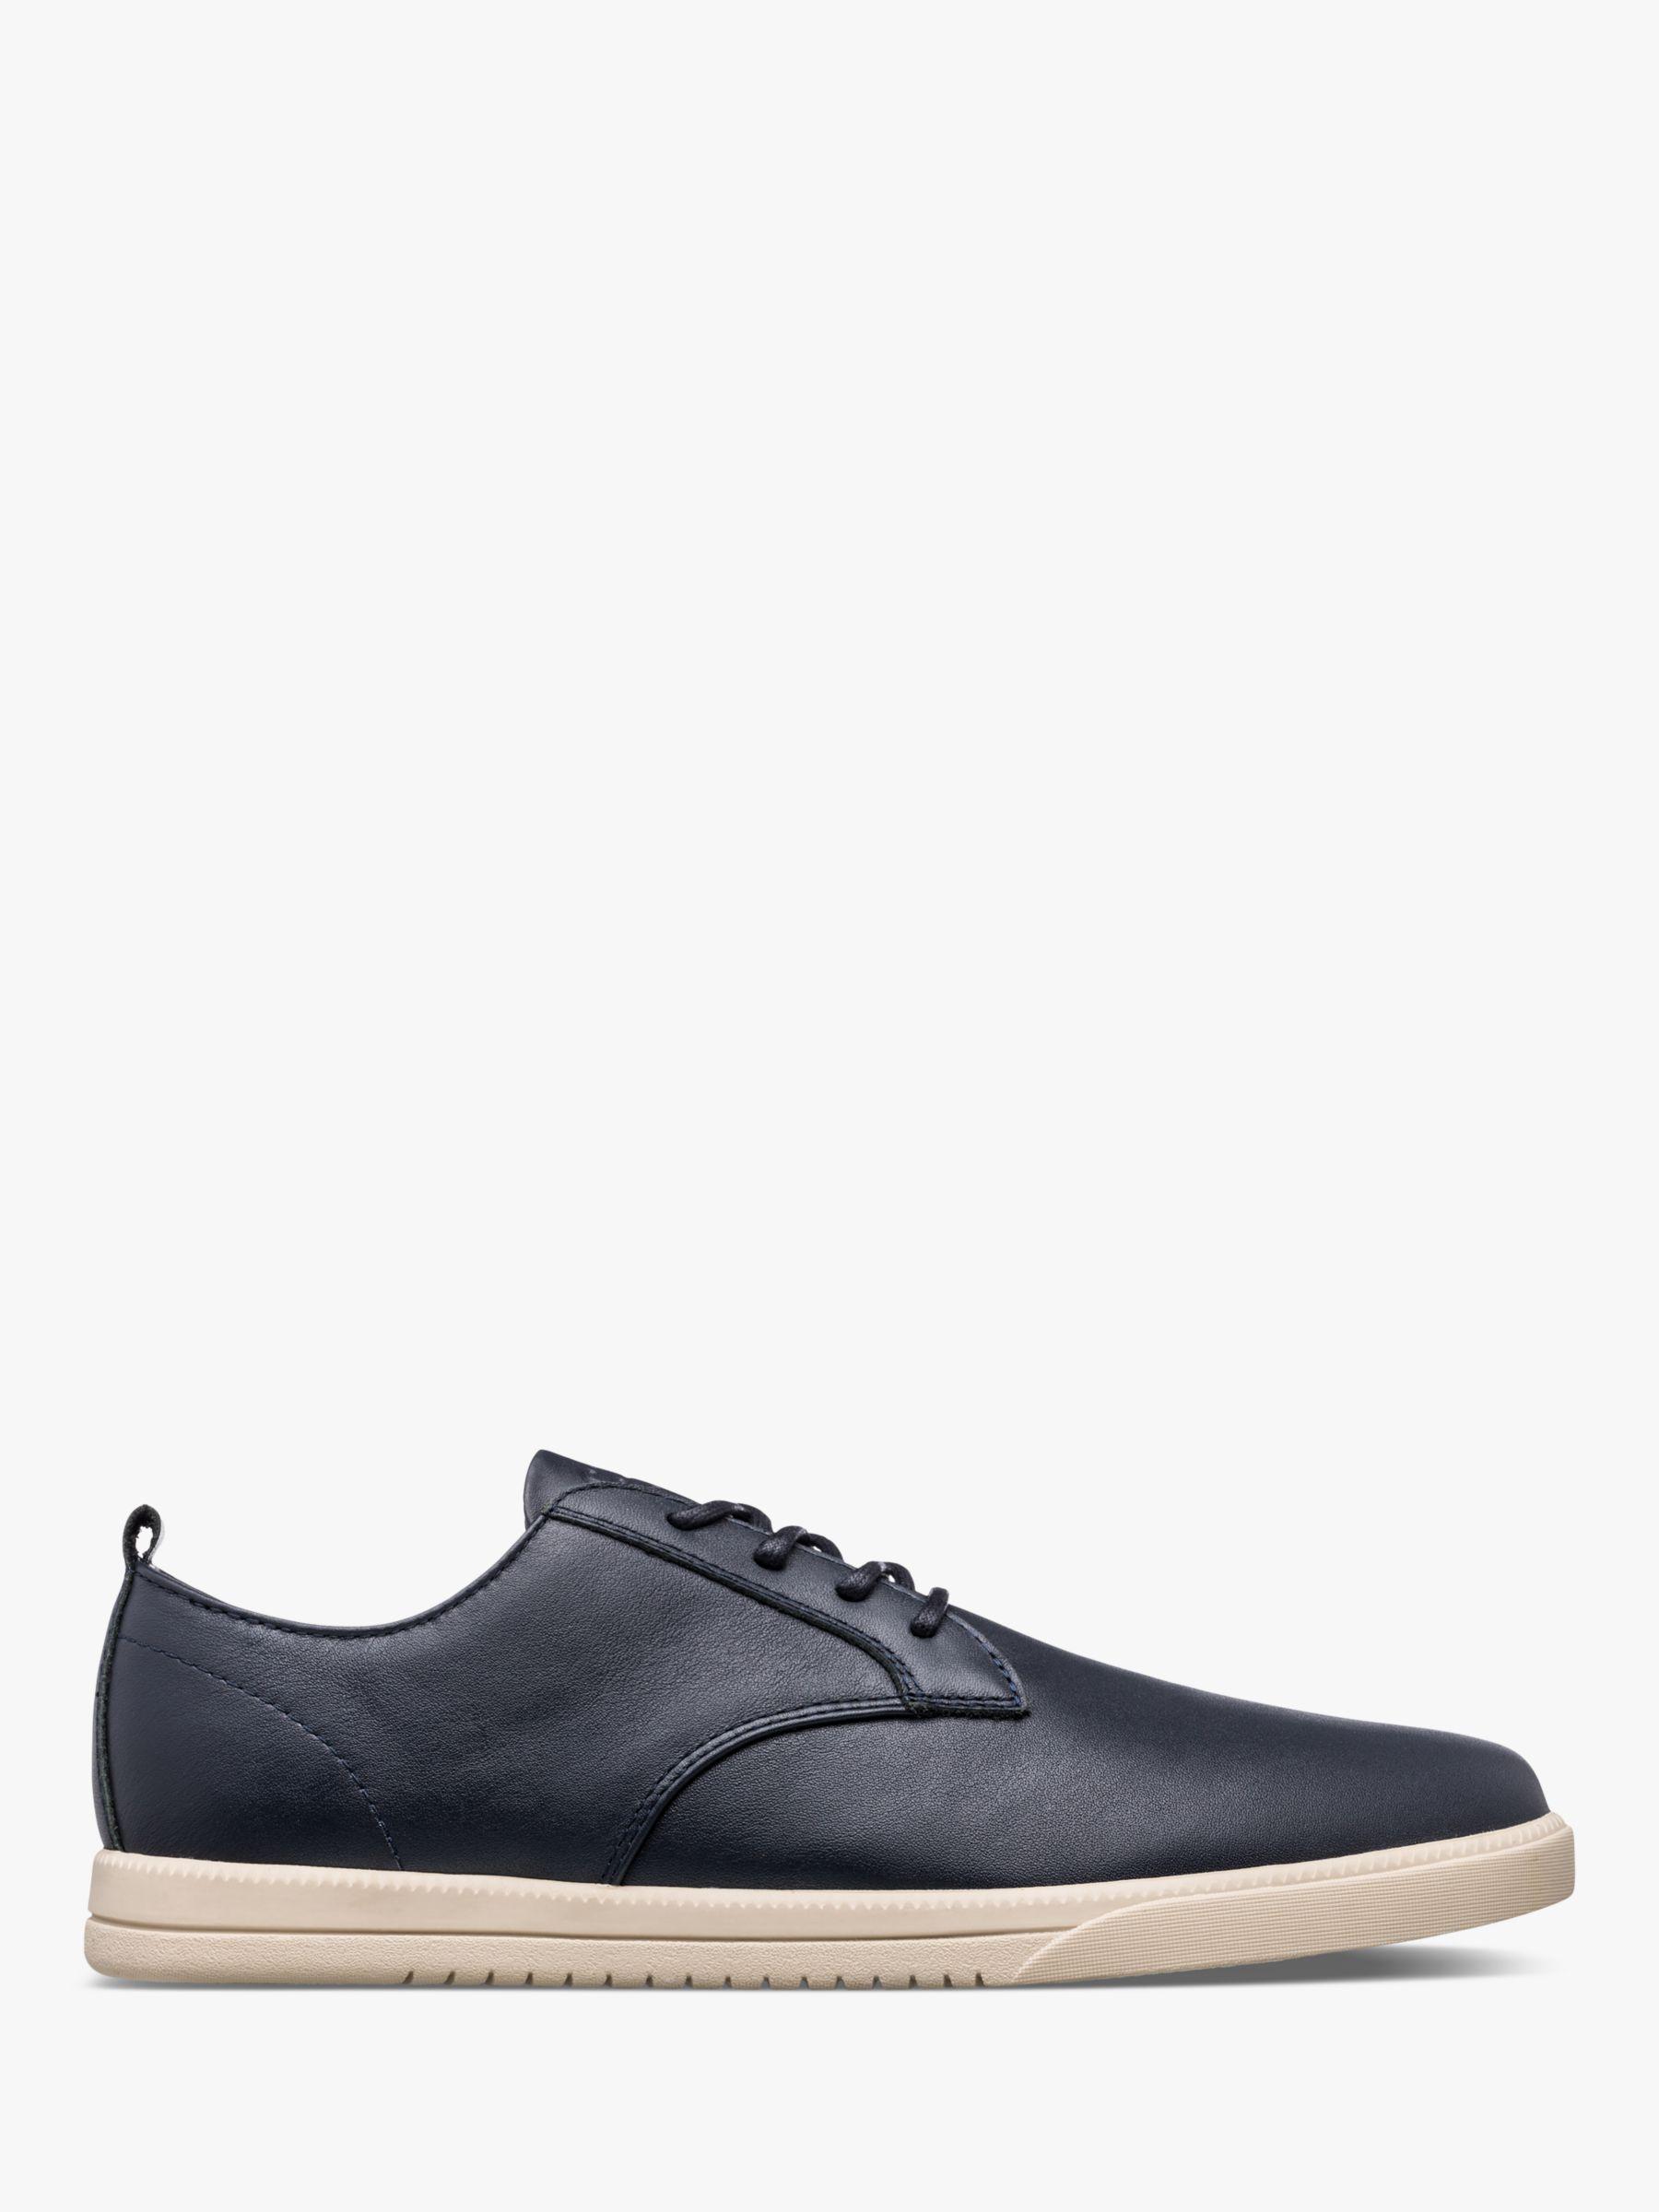 Clae CLAE Ellington Leather Derby Shoes, Navy